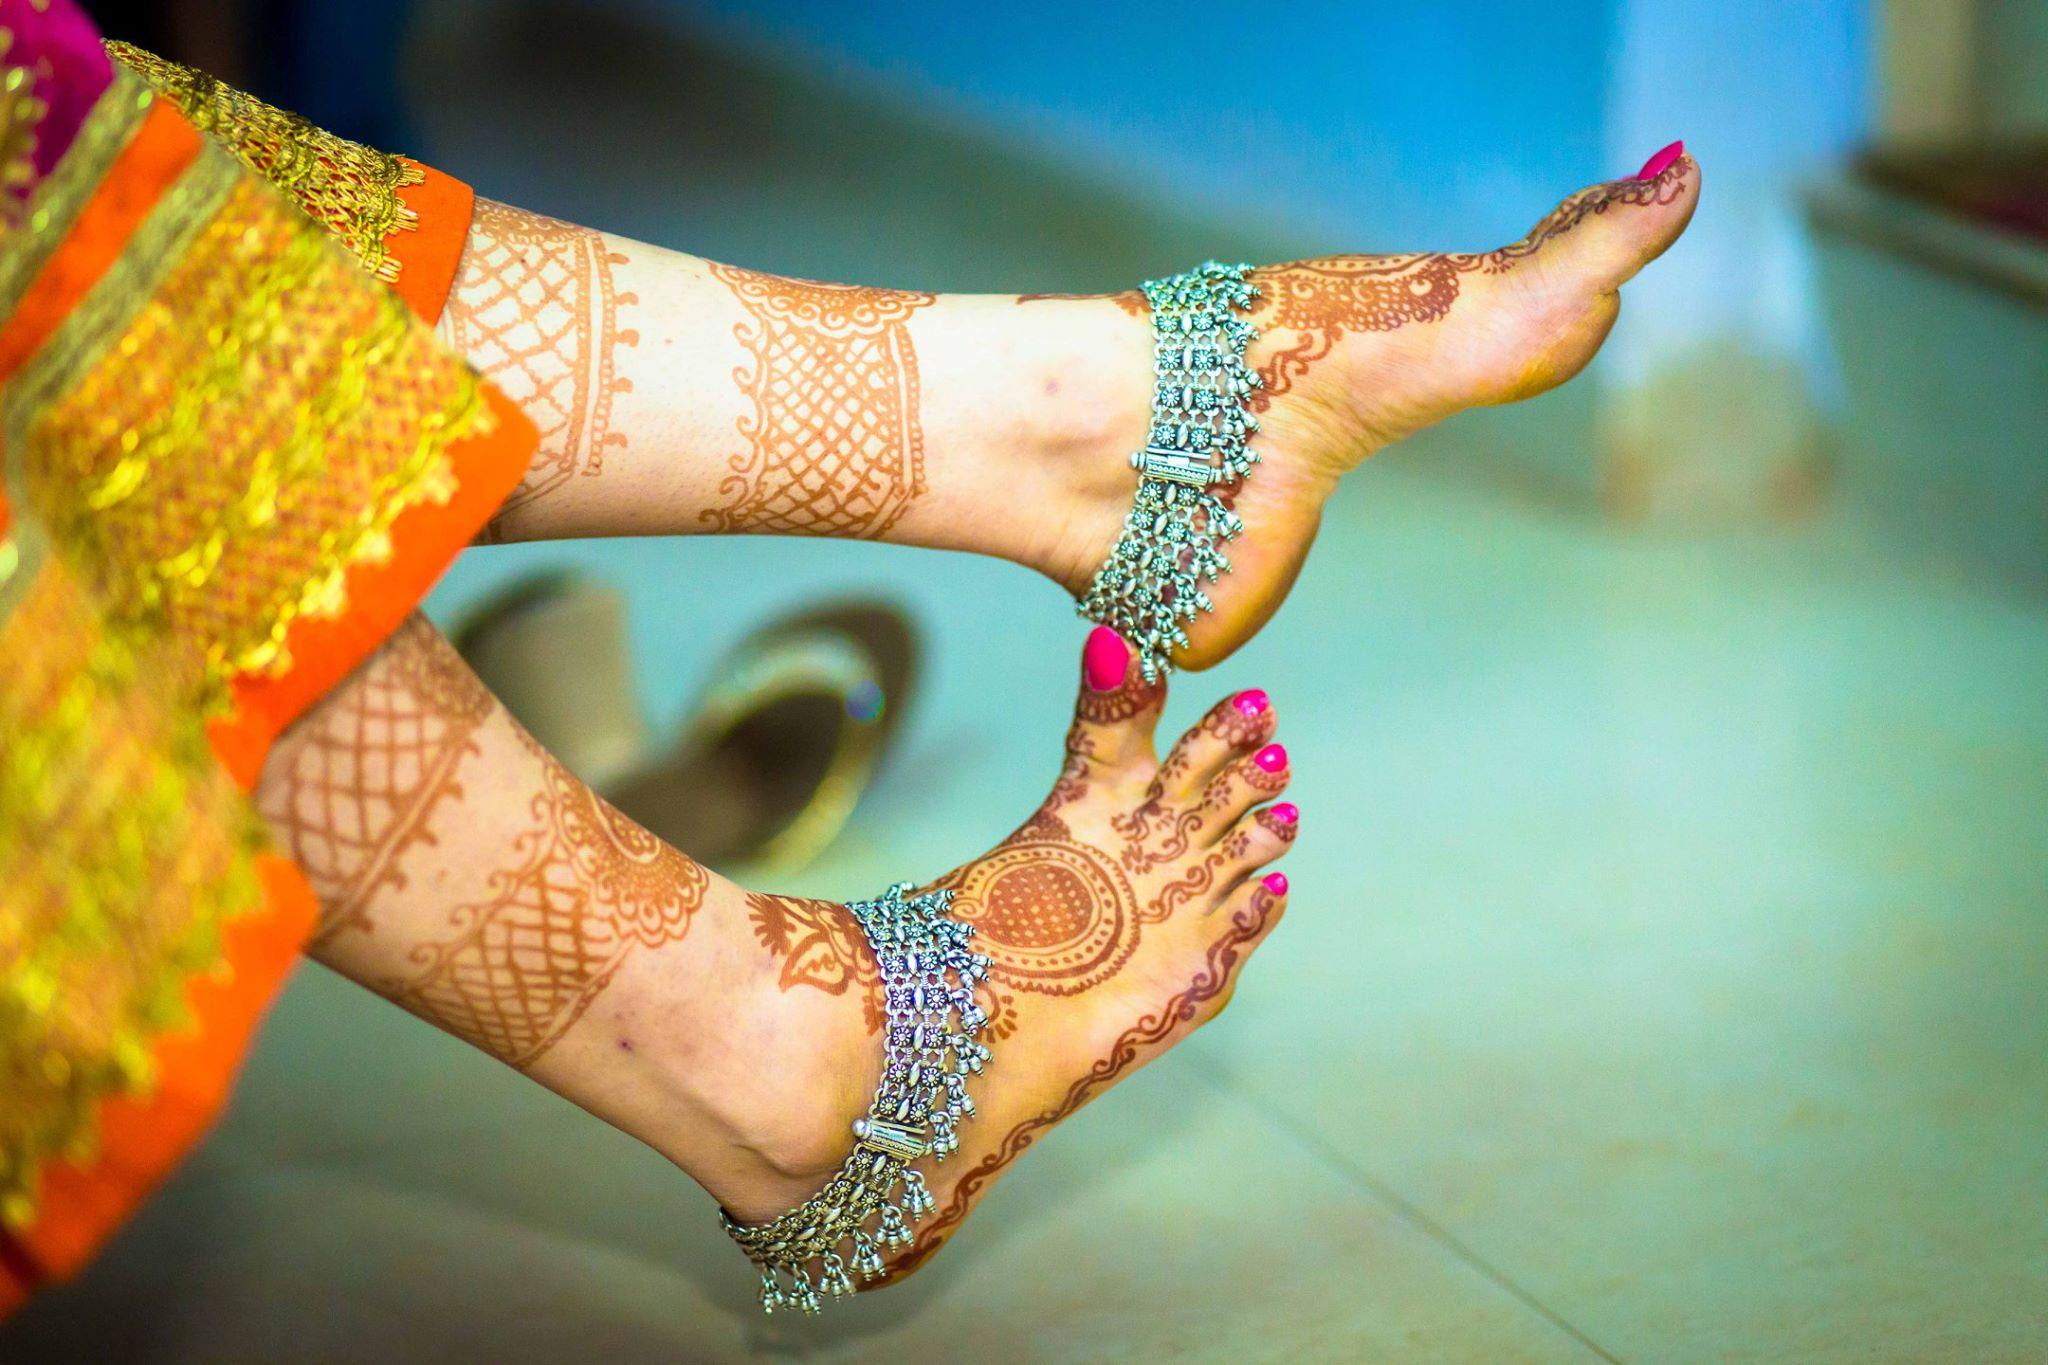 PunjabKesari, Unique Style Payal Designs Image, यूनिक स्टाइल पायल डिज़ाइन इमेज